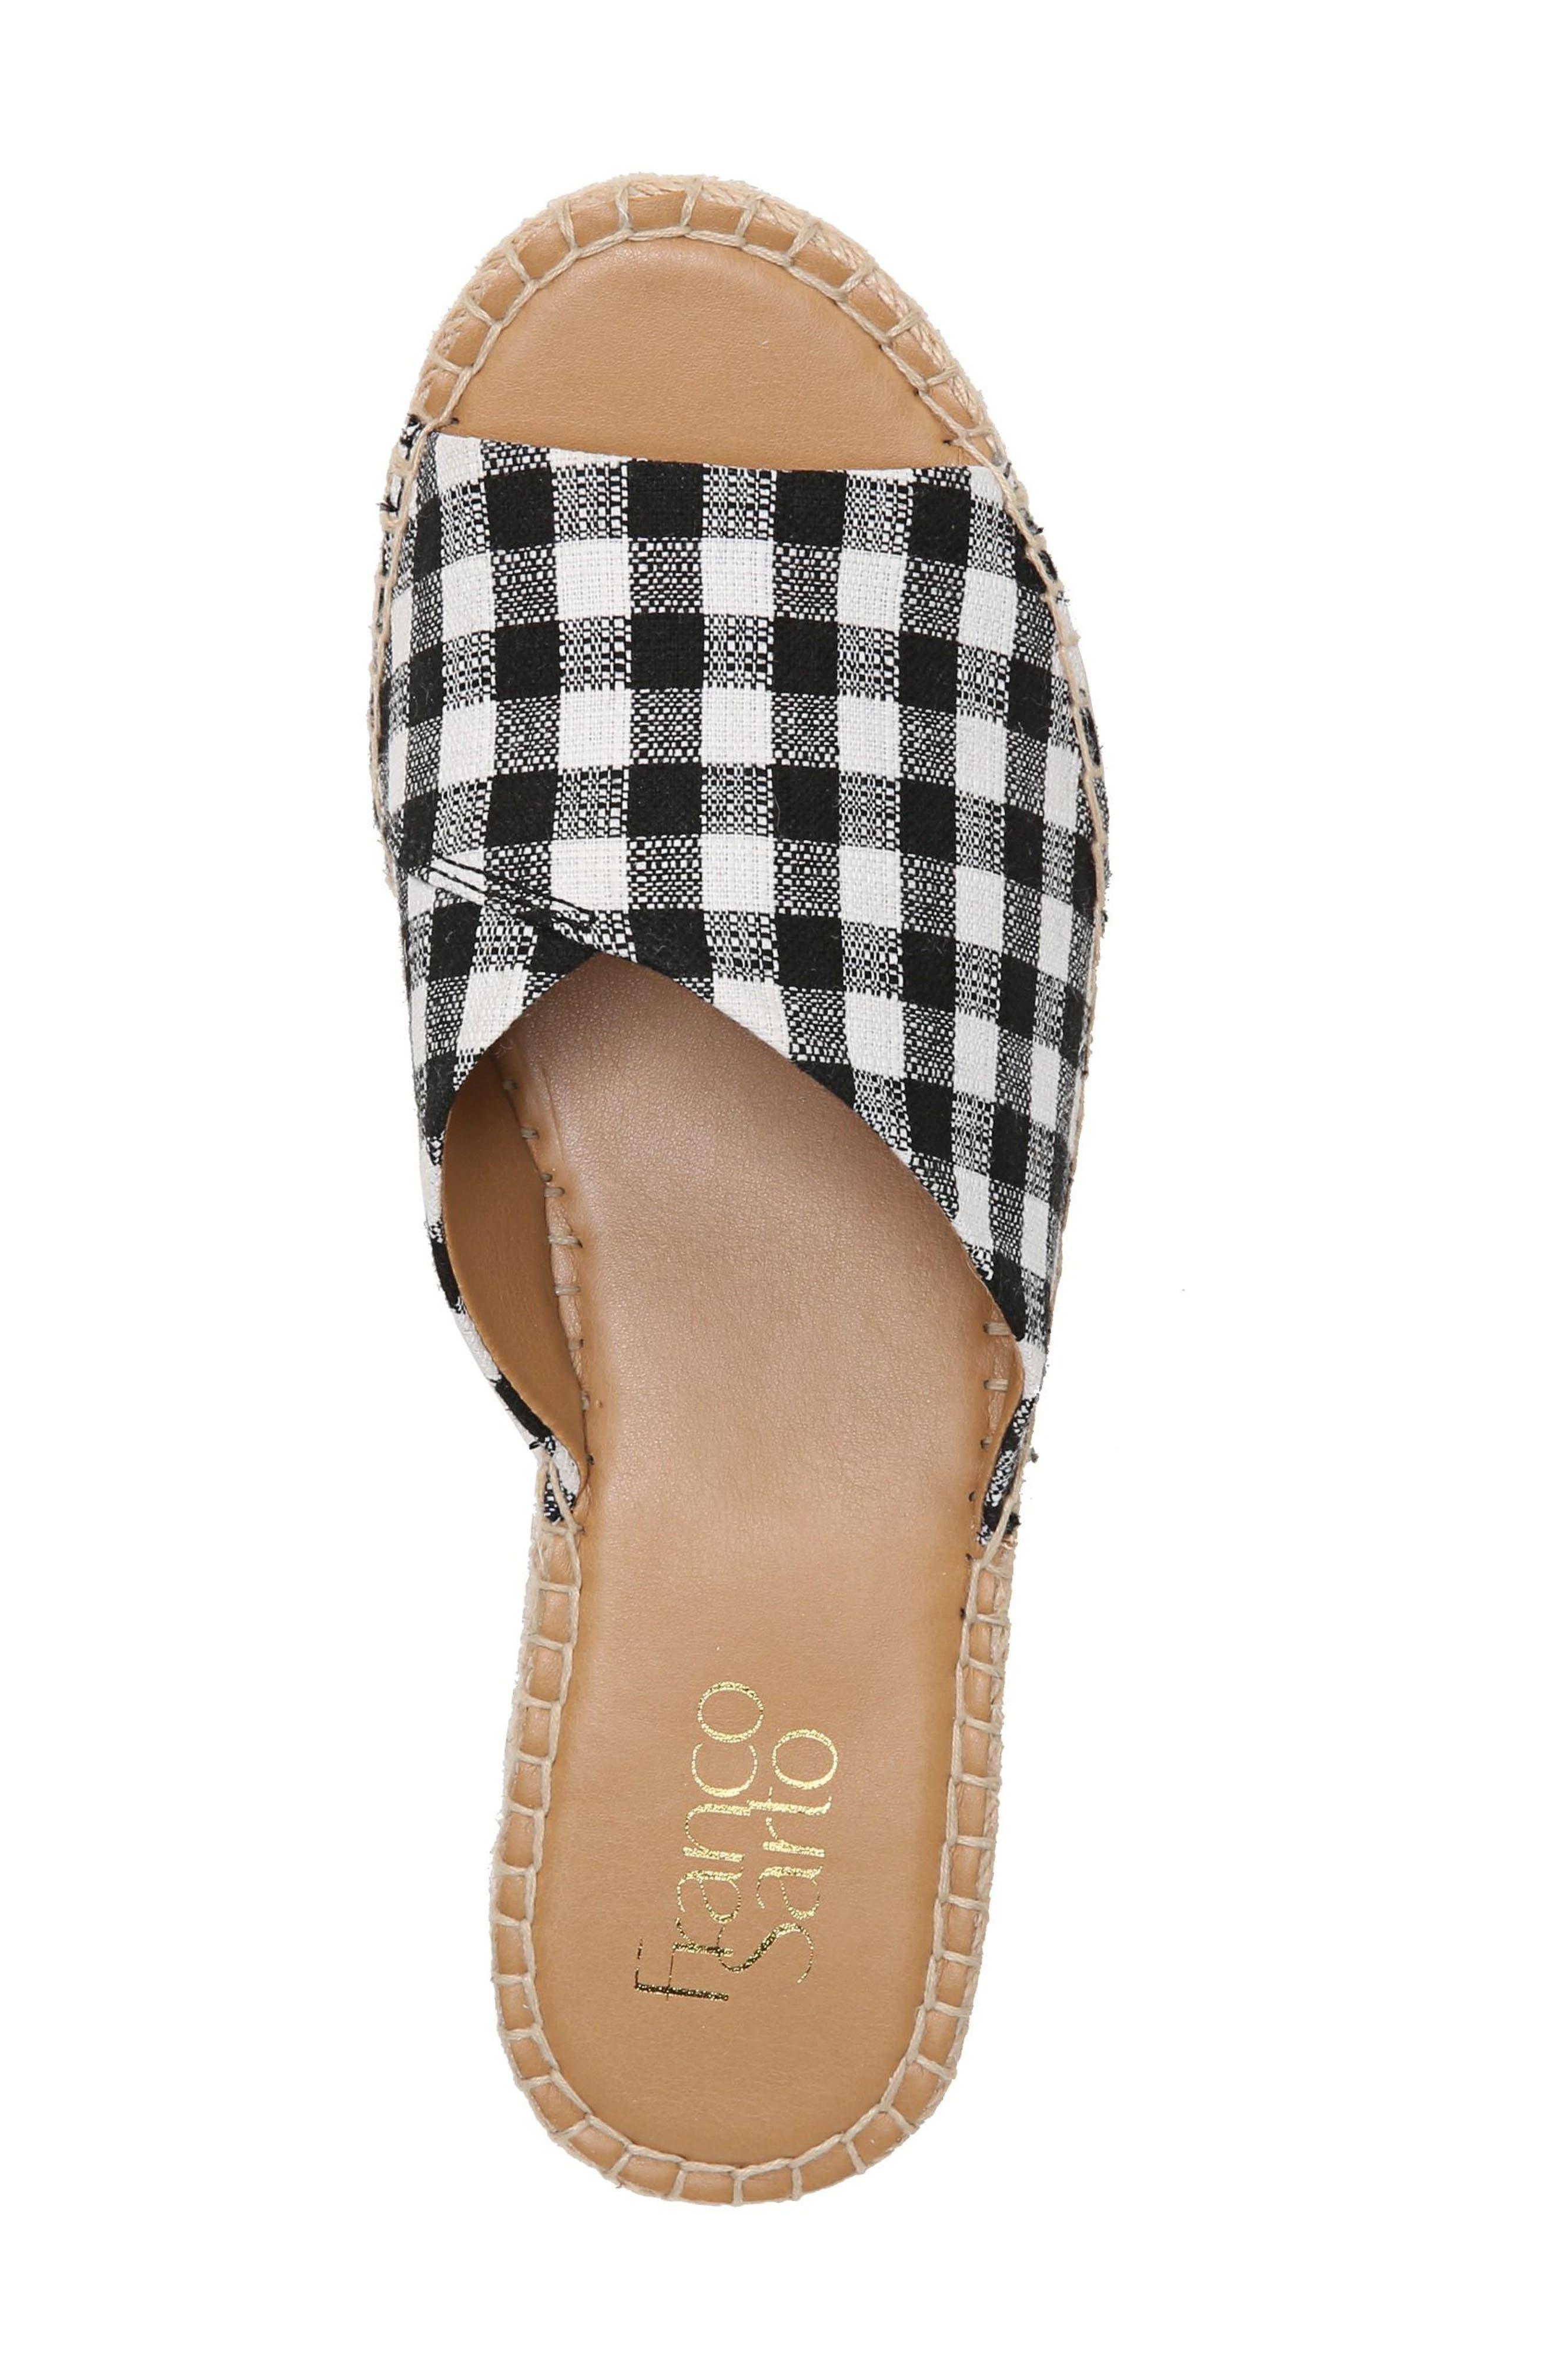 SARTO by Franco Sarto Pinot Platform Wedge Slide Sandal,                             Alternate thumbnail 5, color,                             BLACK/ WHITE